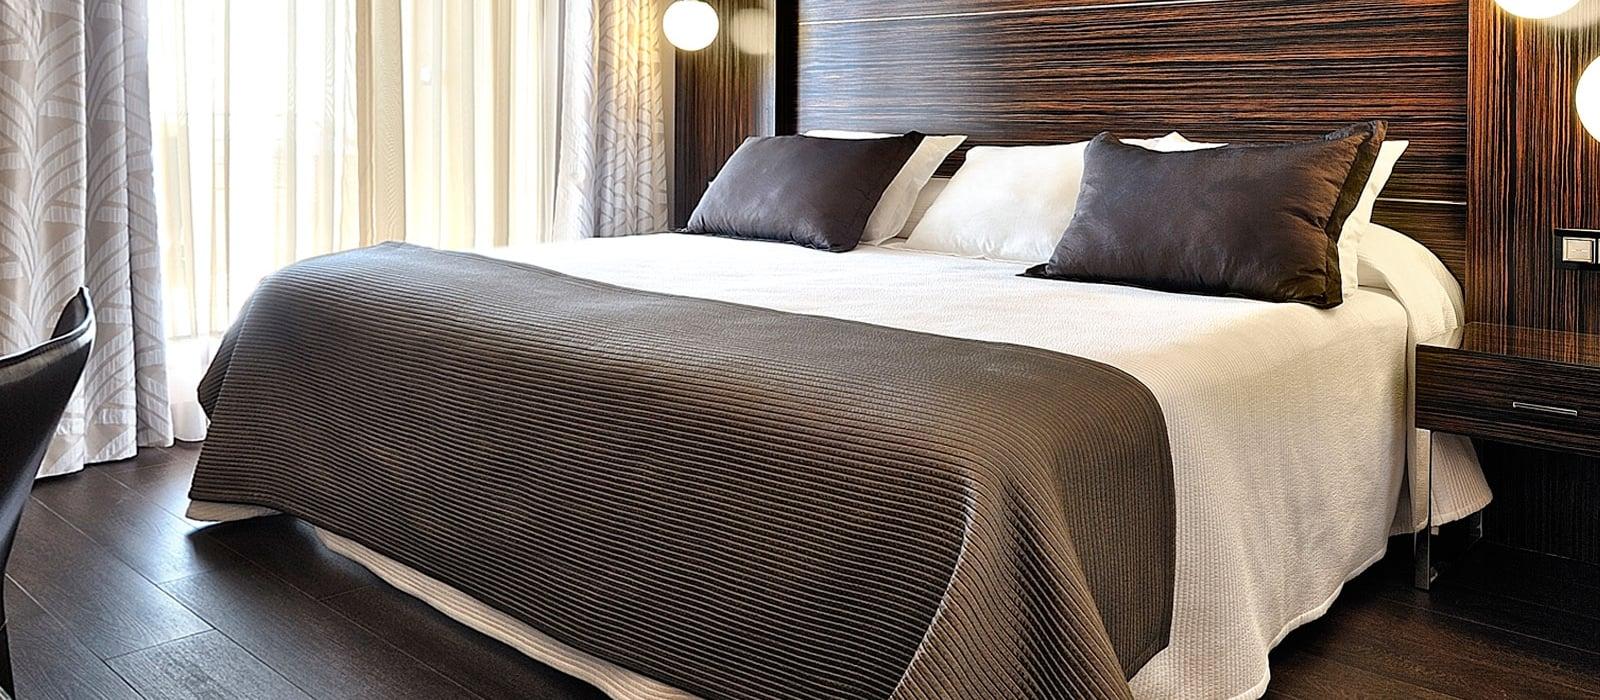 Duplex Suite - Camere Aleysa Hotel Boutique & Spa - Vincci Hoteles